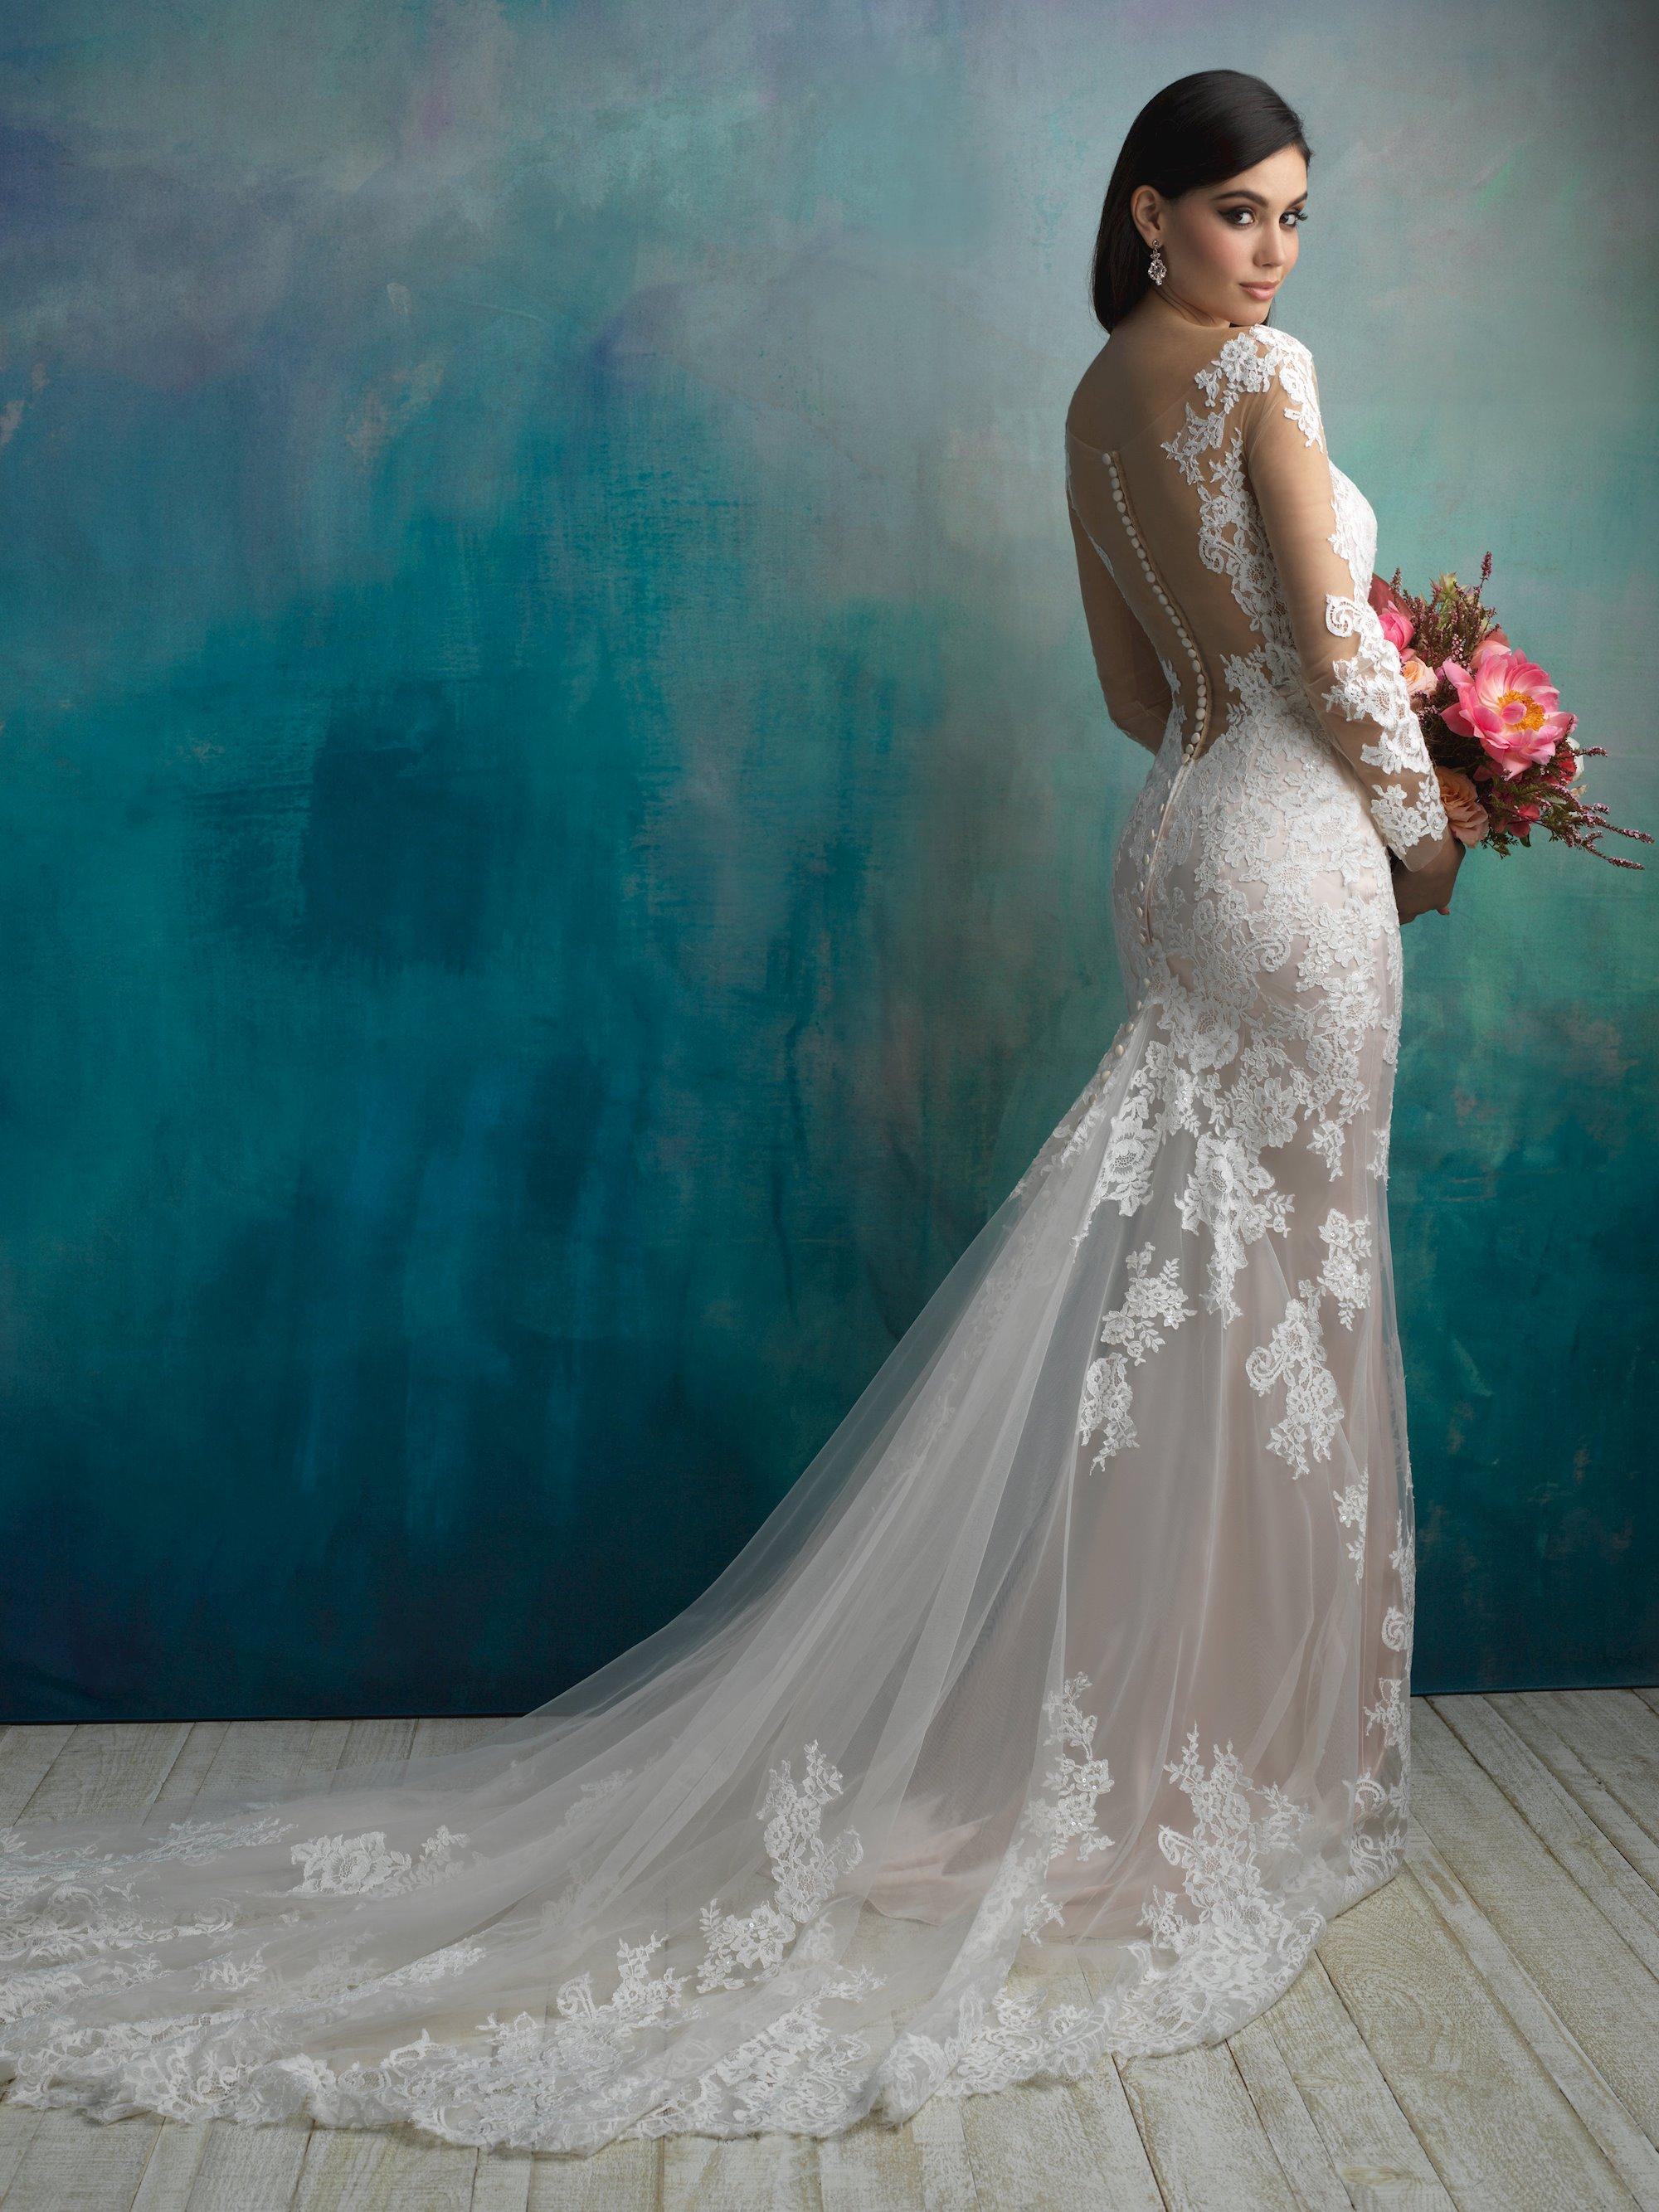 Allure Bridal 2018 Wedding Dresses | Regiss in Kentucky - 9506